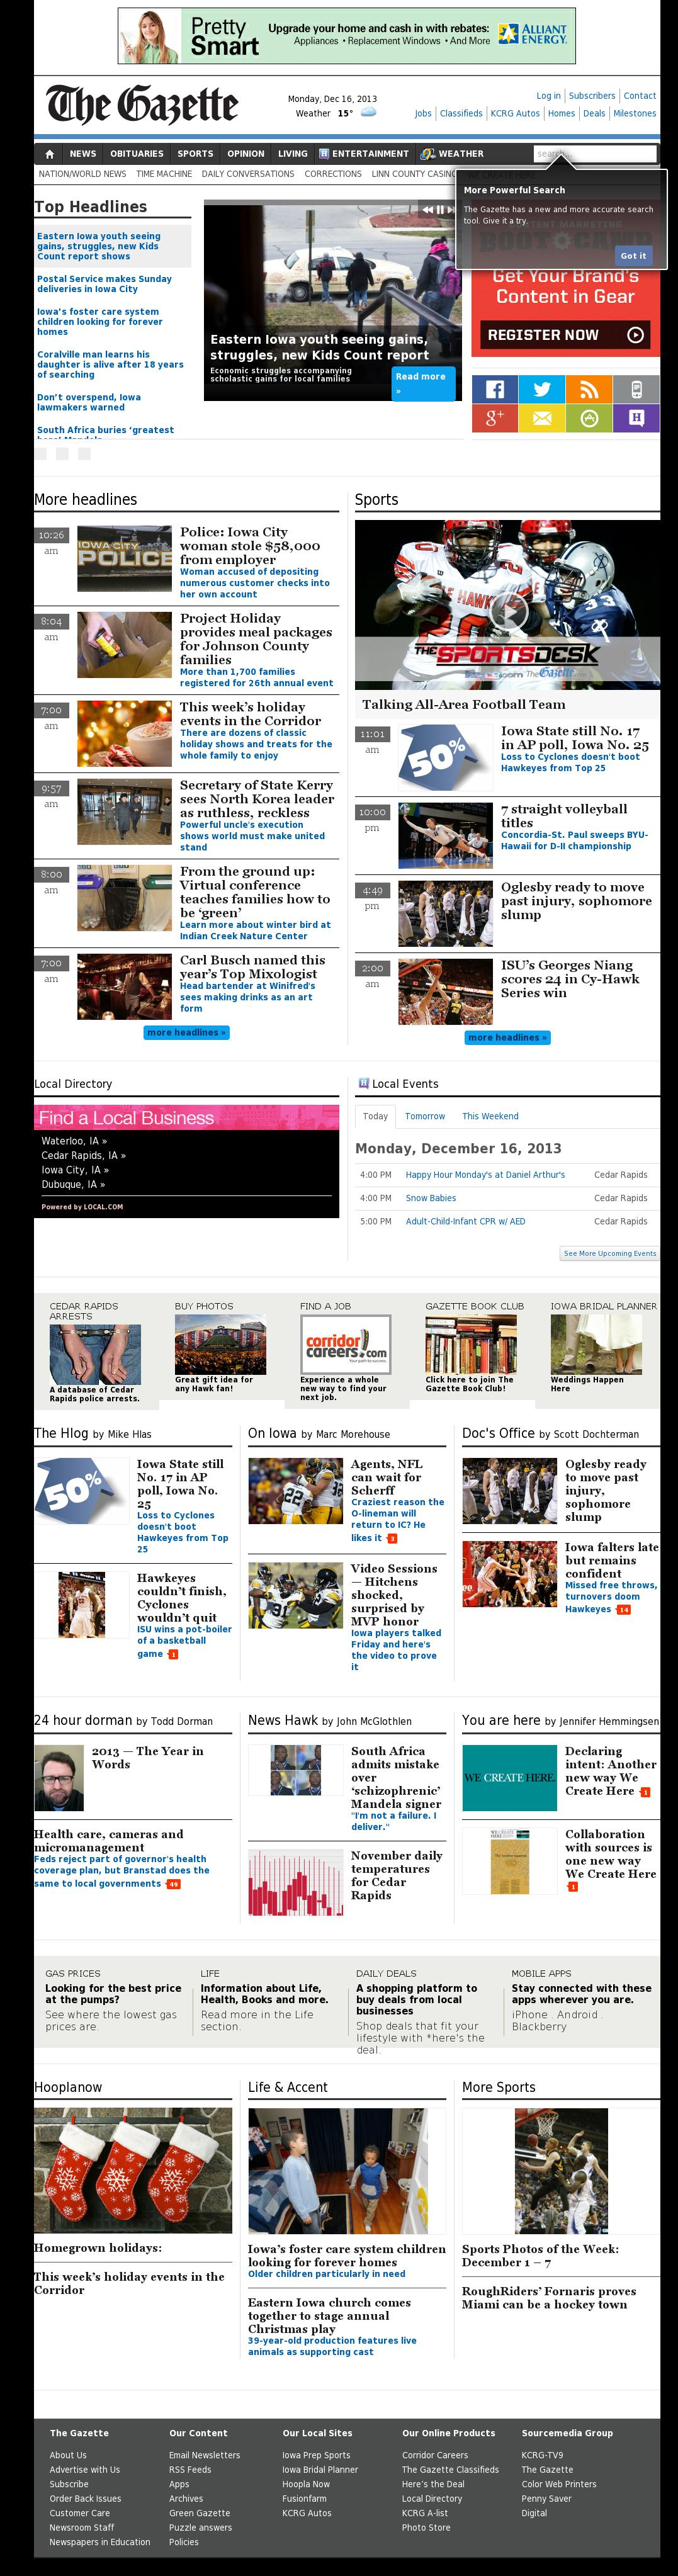 The (Cedar Rapids) Gazette at Monday Dec. 16, 2013, 6:05 p.m. UTC